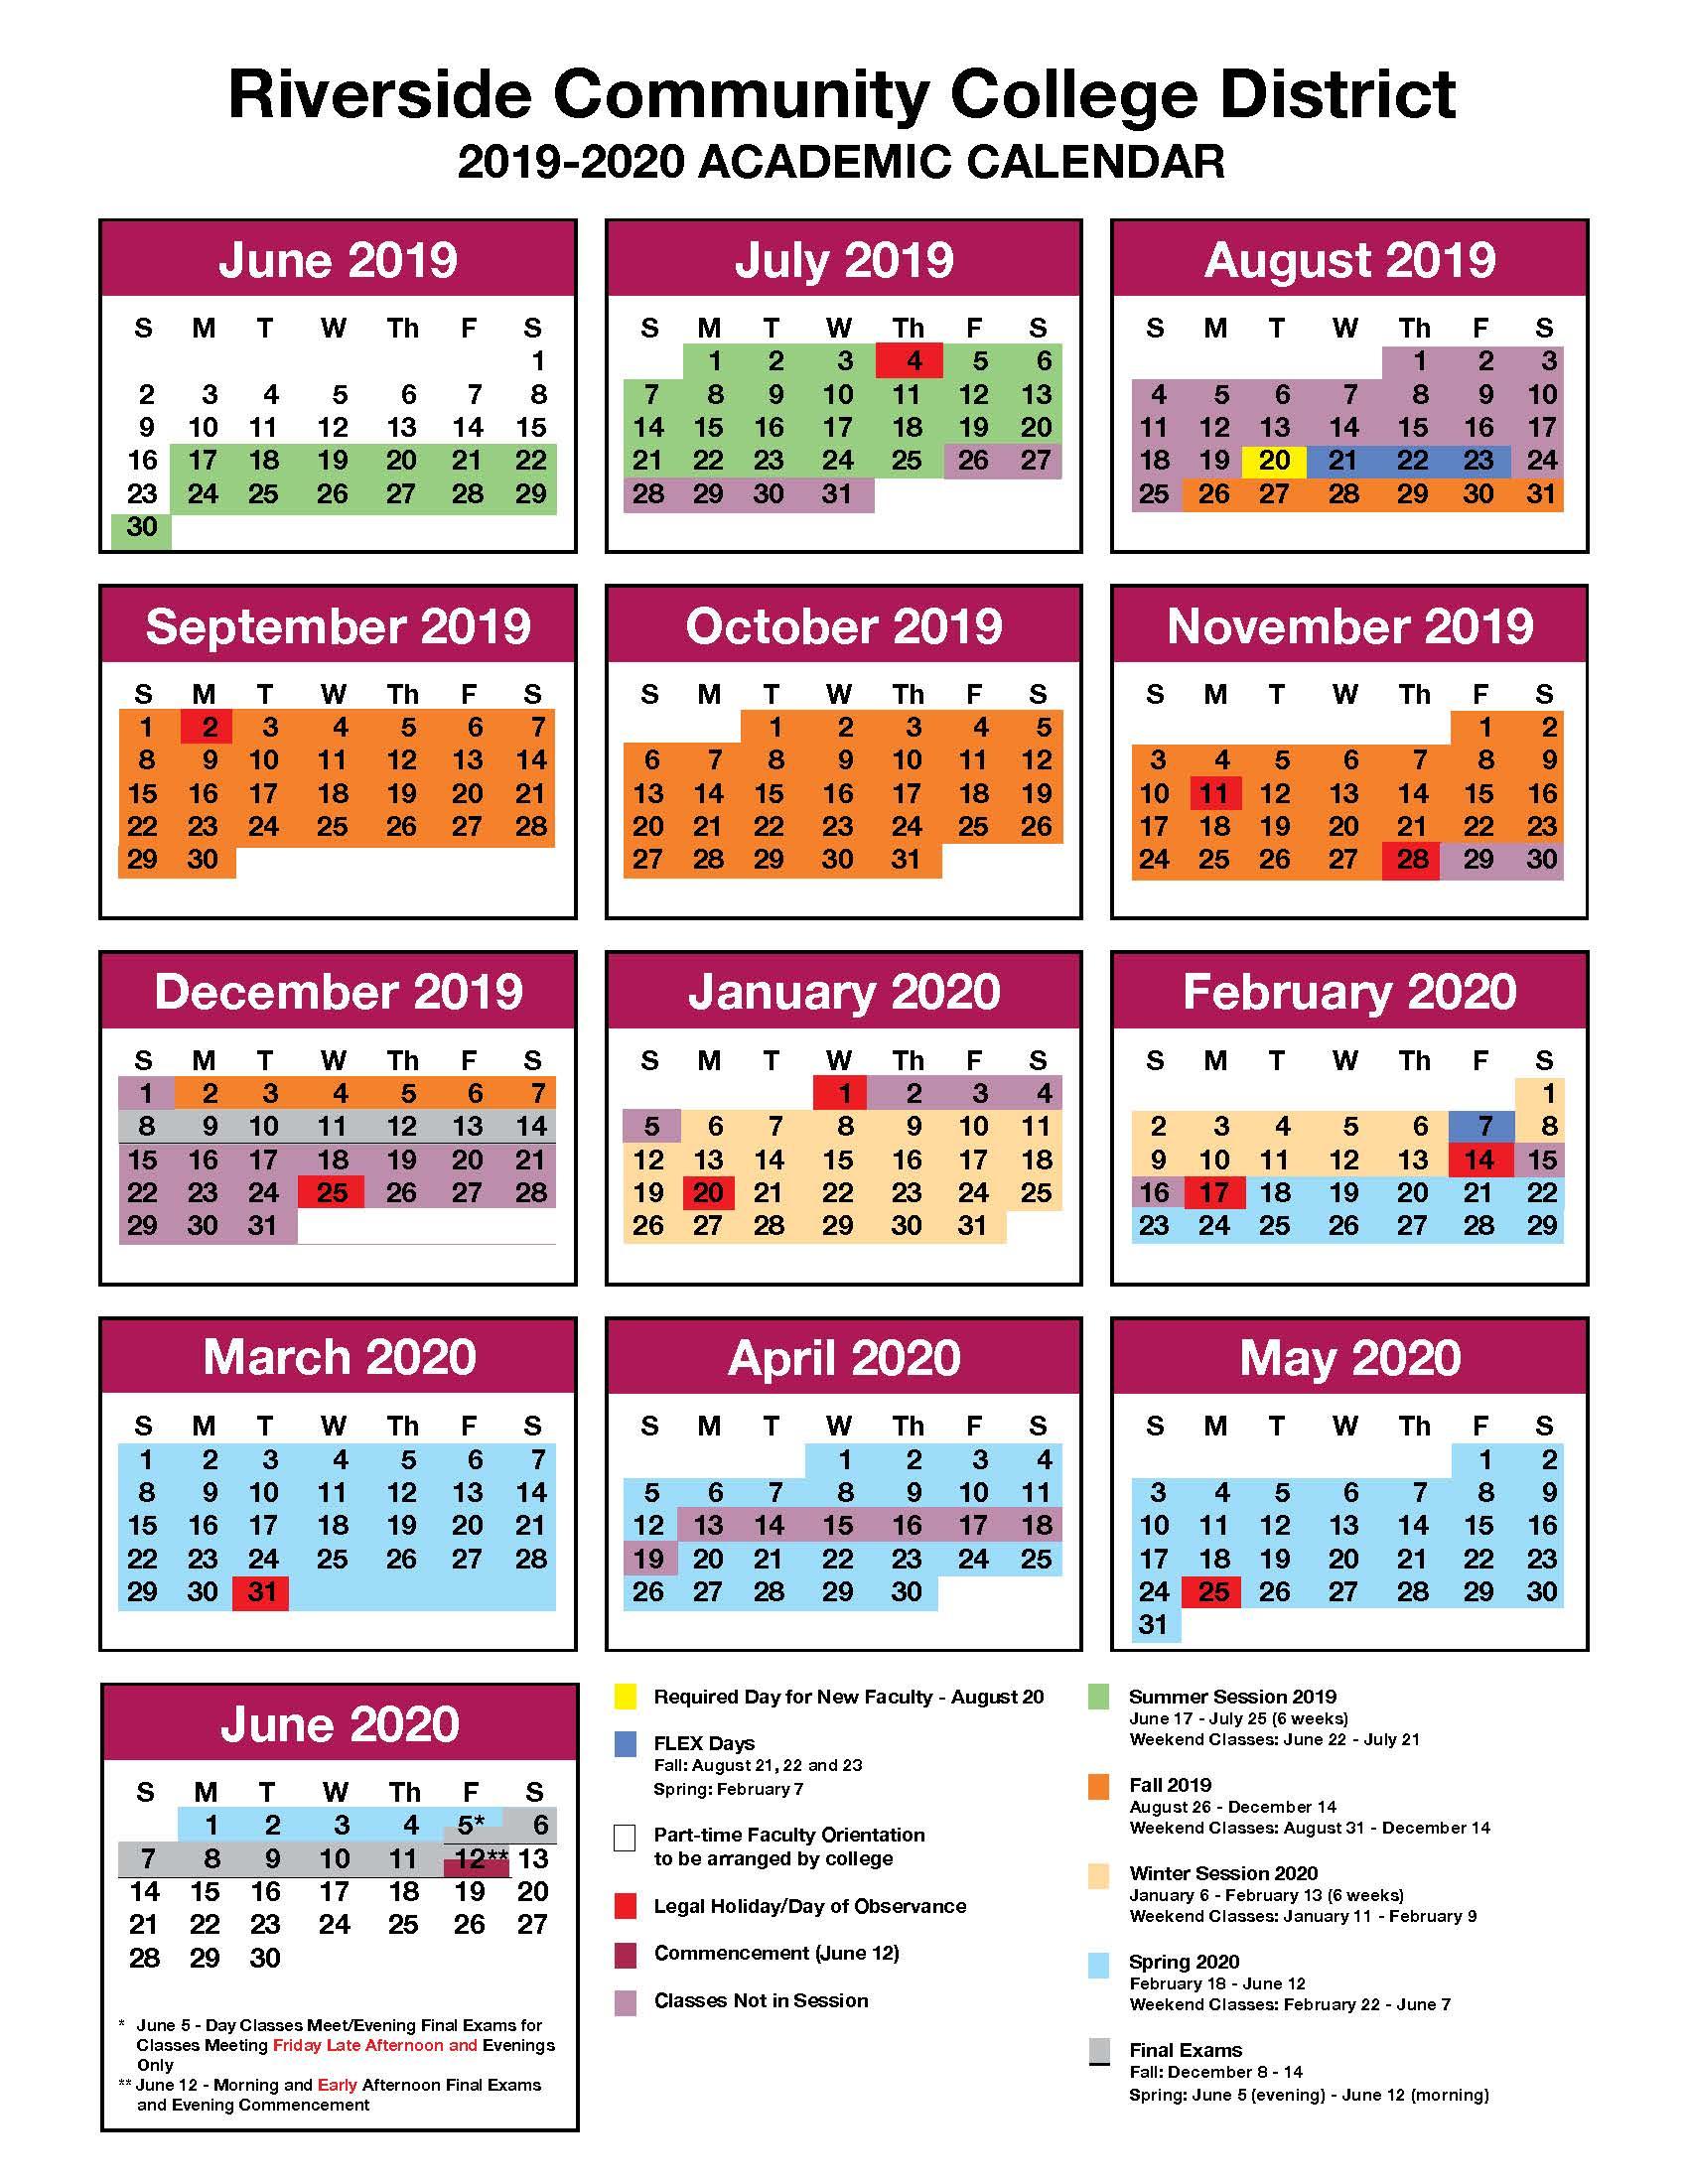 Jfk And Norco College Calendar 2019 2020 – John F. Kennedy Regarding La Habra High School Year Calendar